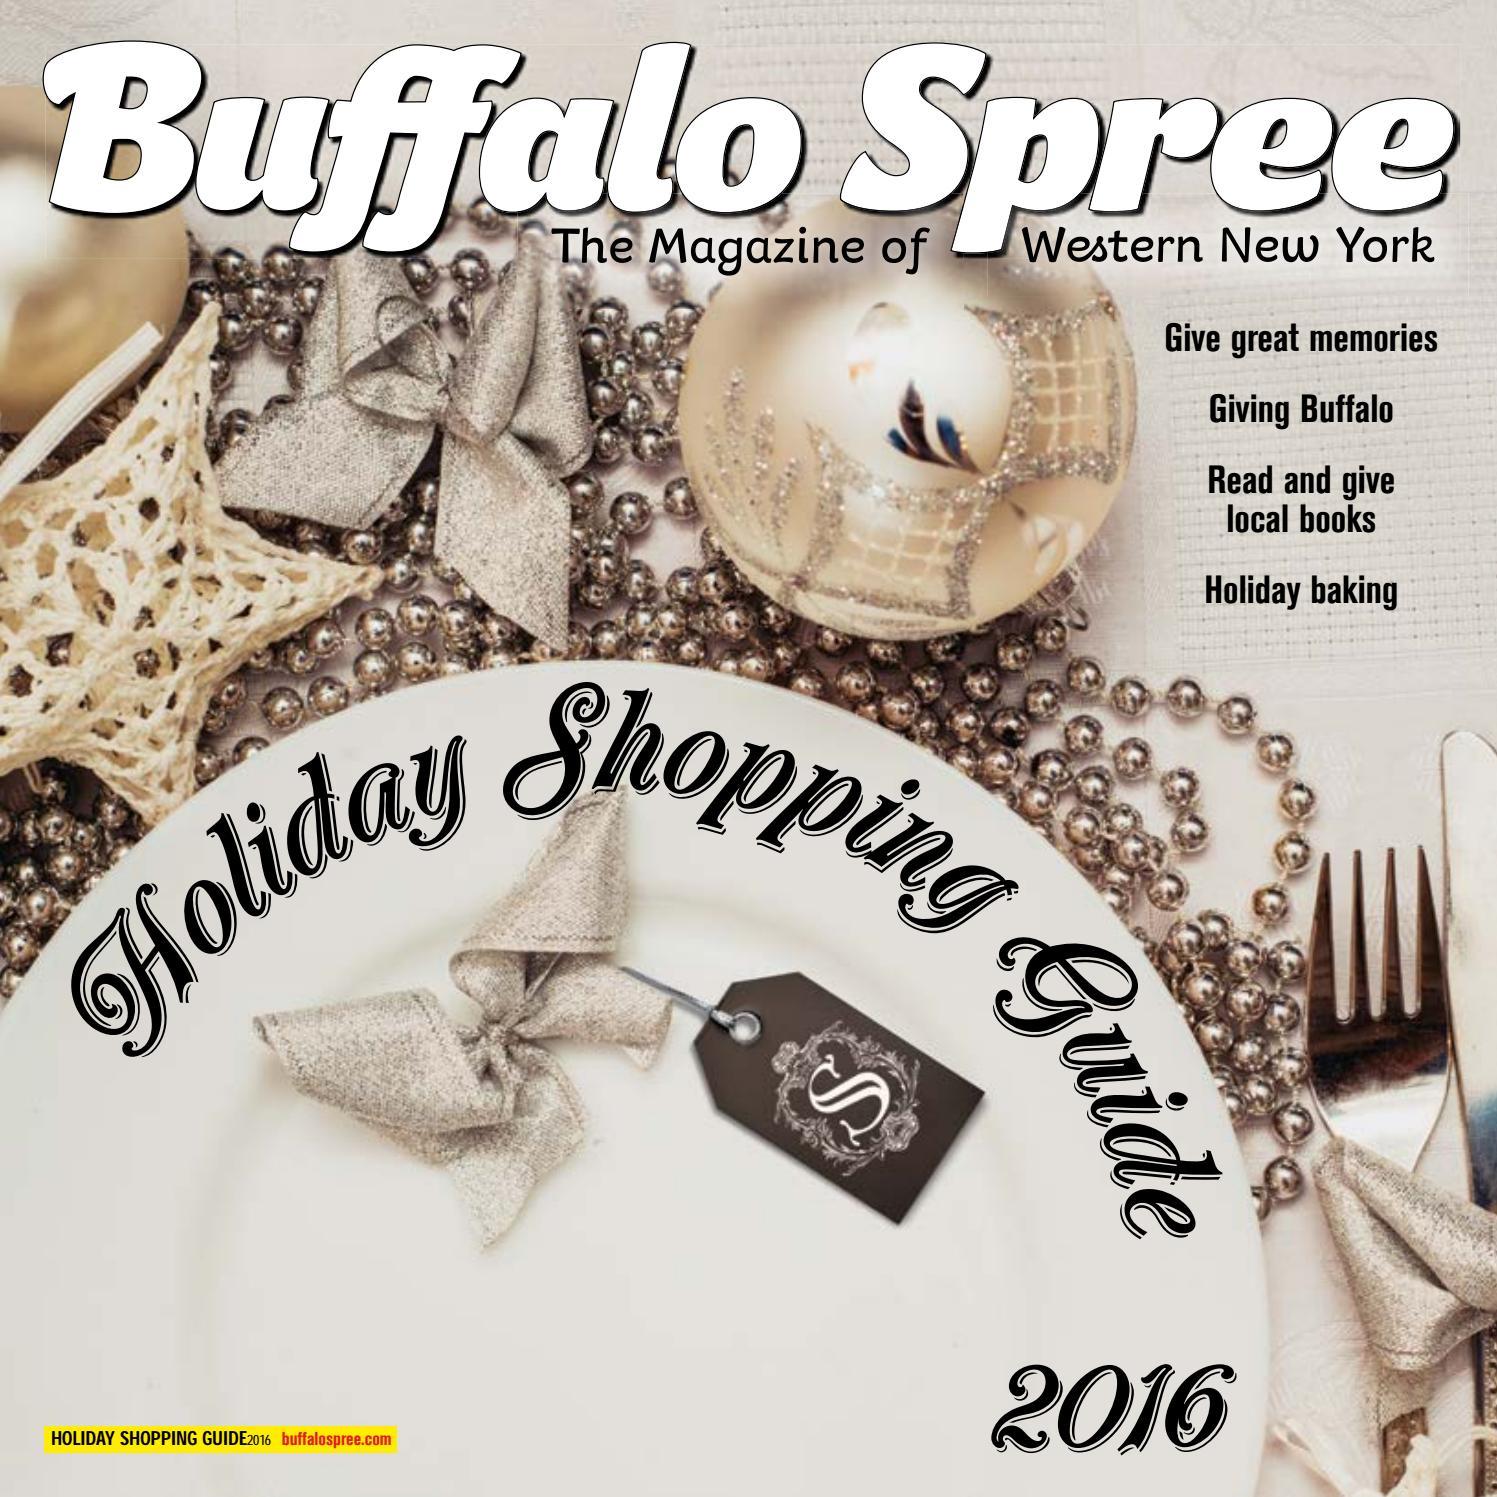 5b3947baf56 Buffalo spree's Holiday Shopping Guide 2016 by Buffalo Spree - issuu